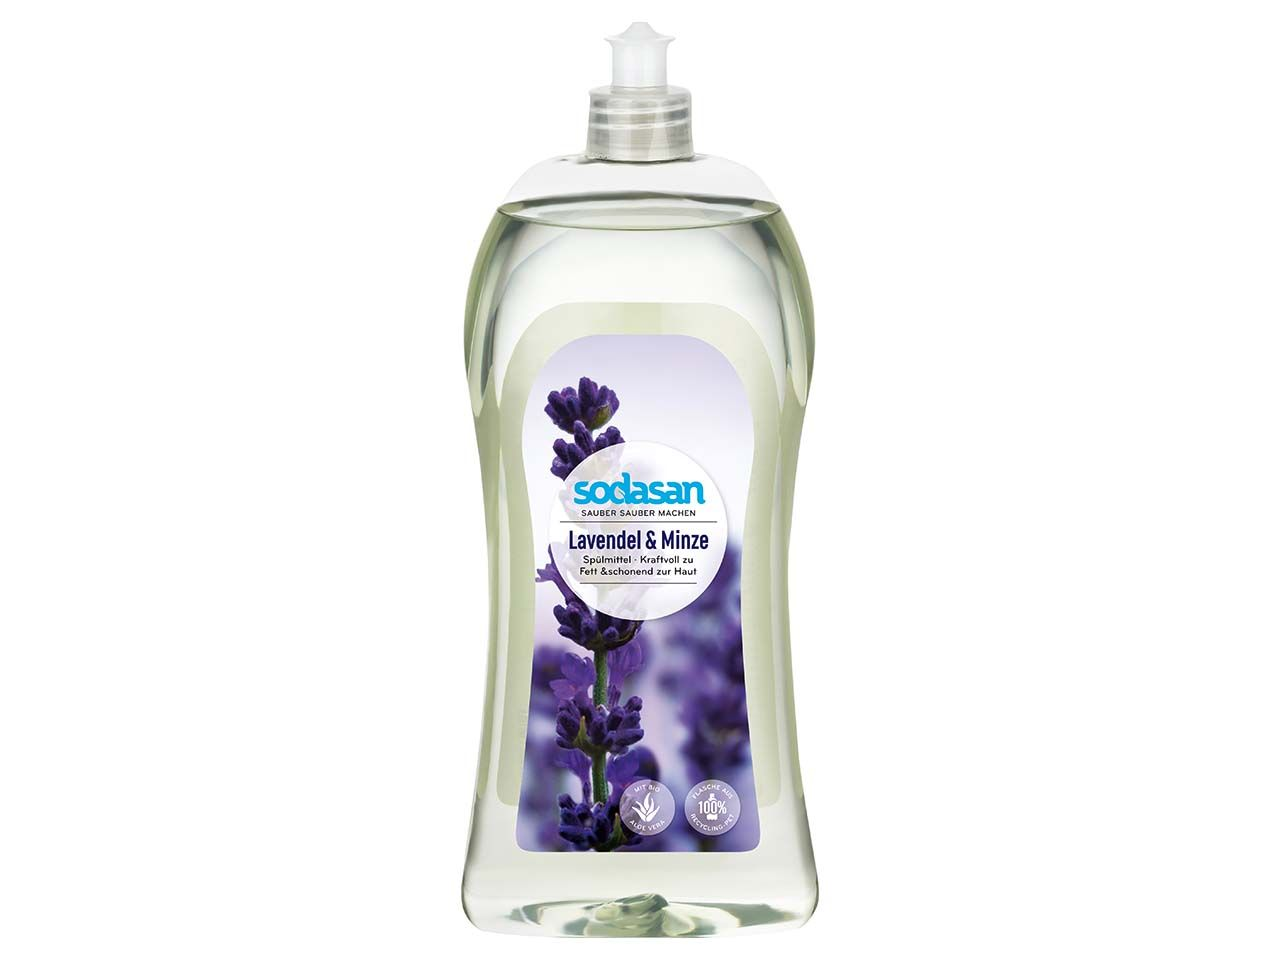 "Sodasan Spülmittel ""Lavendel & Minze"" 1 l 2013"